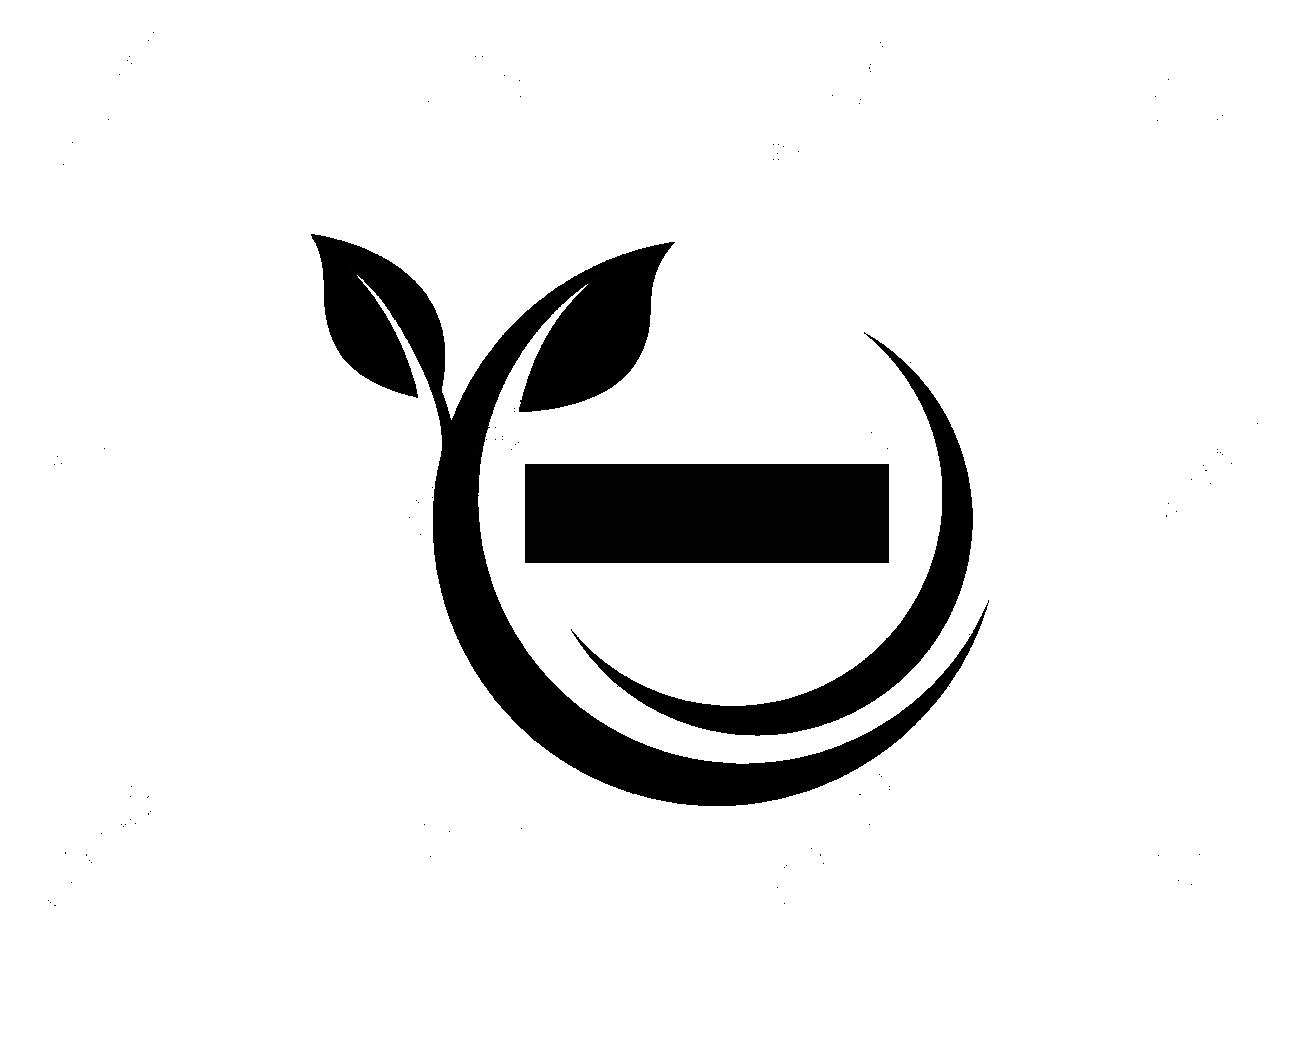 VOSC logo